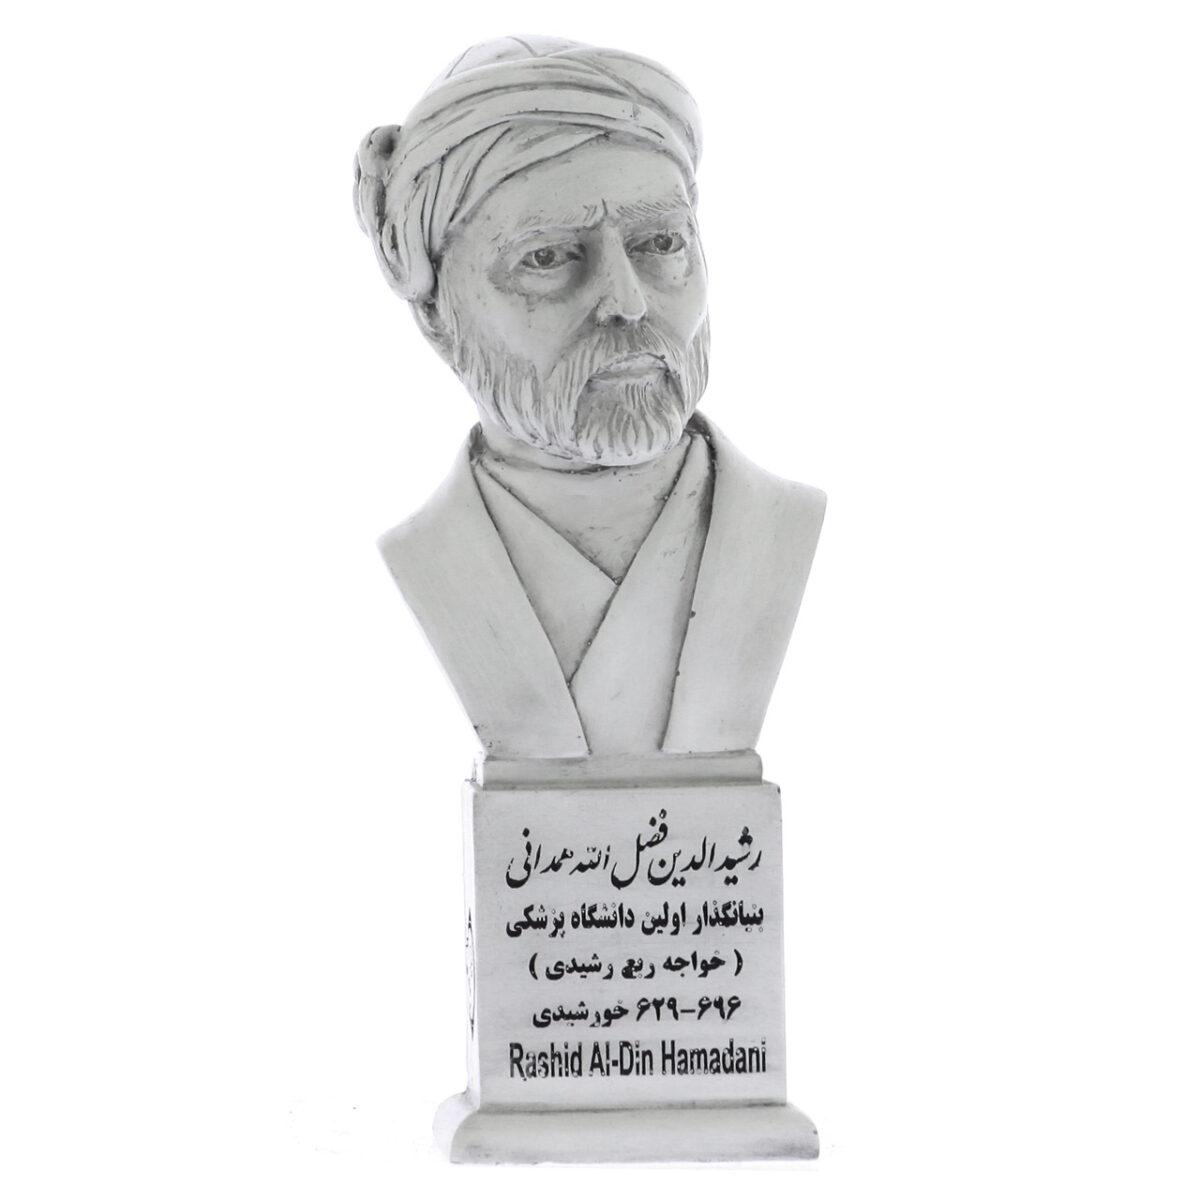 rashidodin hamedani s 1200x1200 - سردیس رشیدالدین فضل الله همدانی